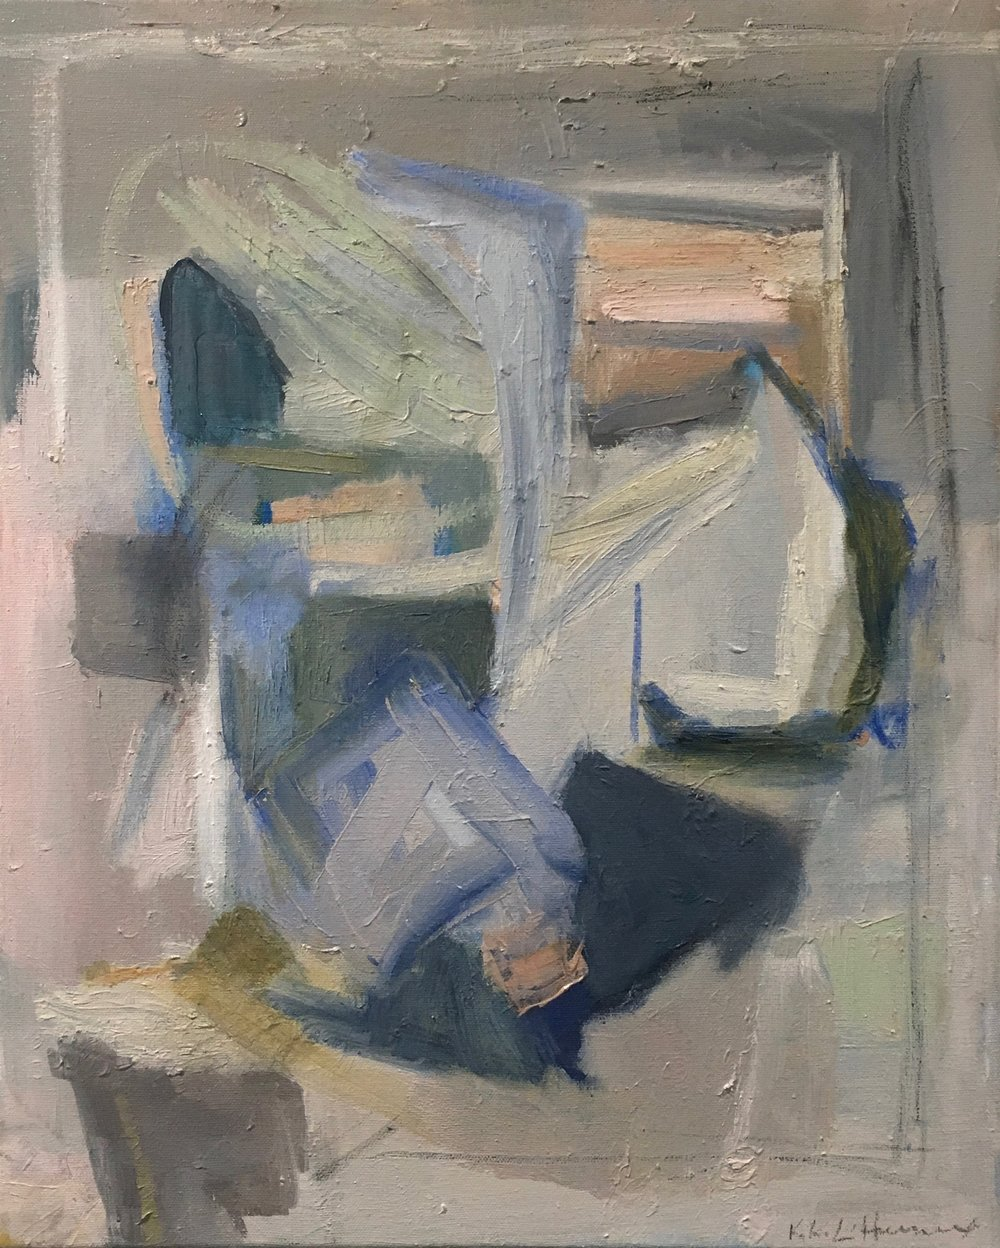 Blu Schuyler, Mixed Media on Canvas, 20 x 16